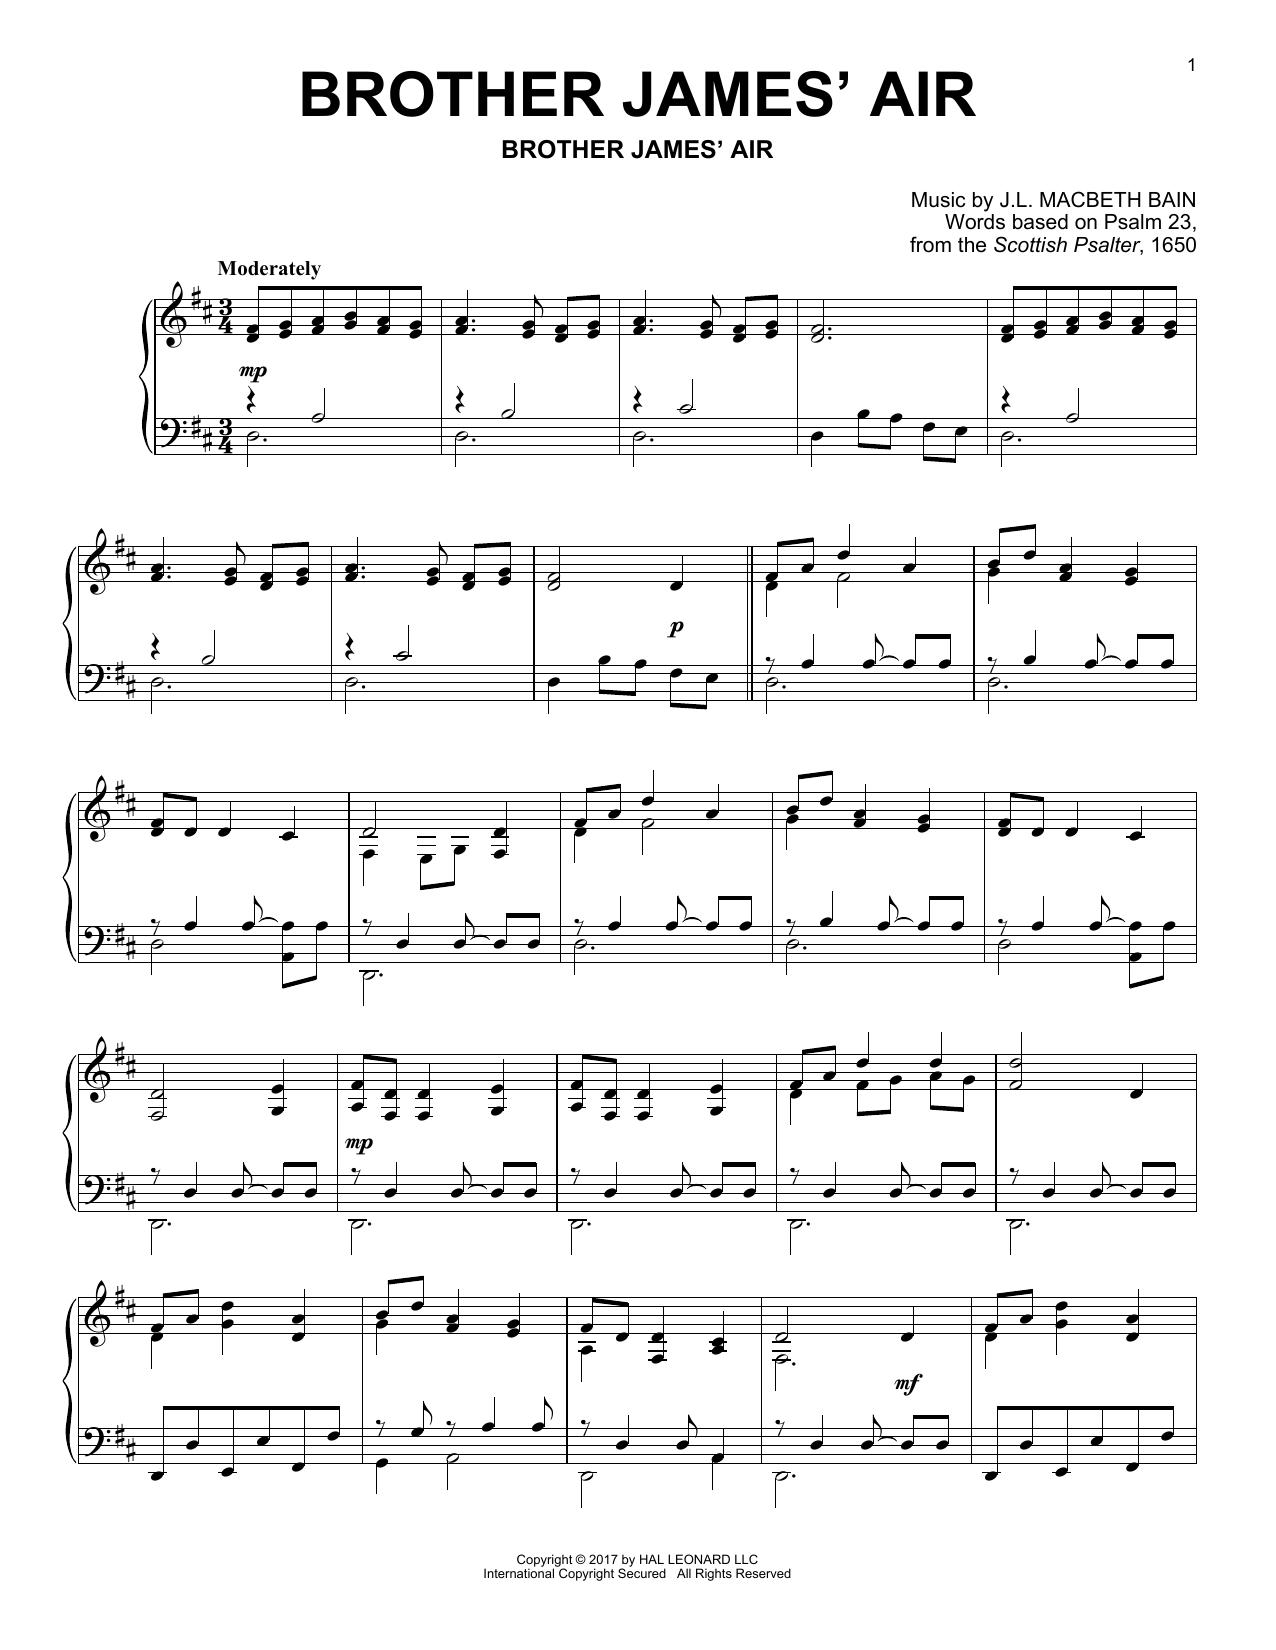 J.L. Macbeth Bain Brother James' Air sheet music notes and chords. Download Printable PDF.